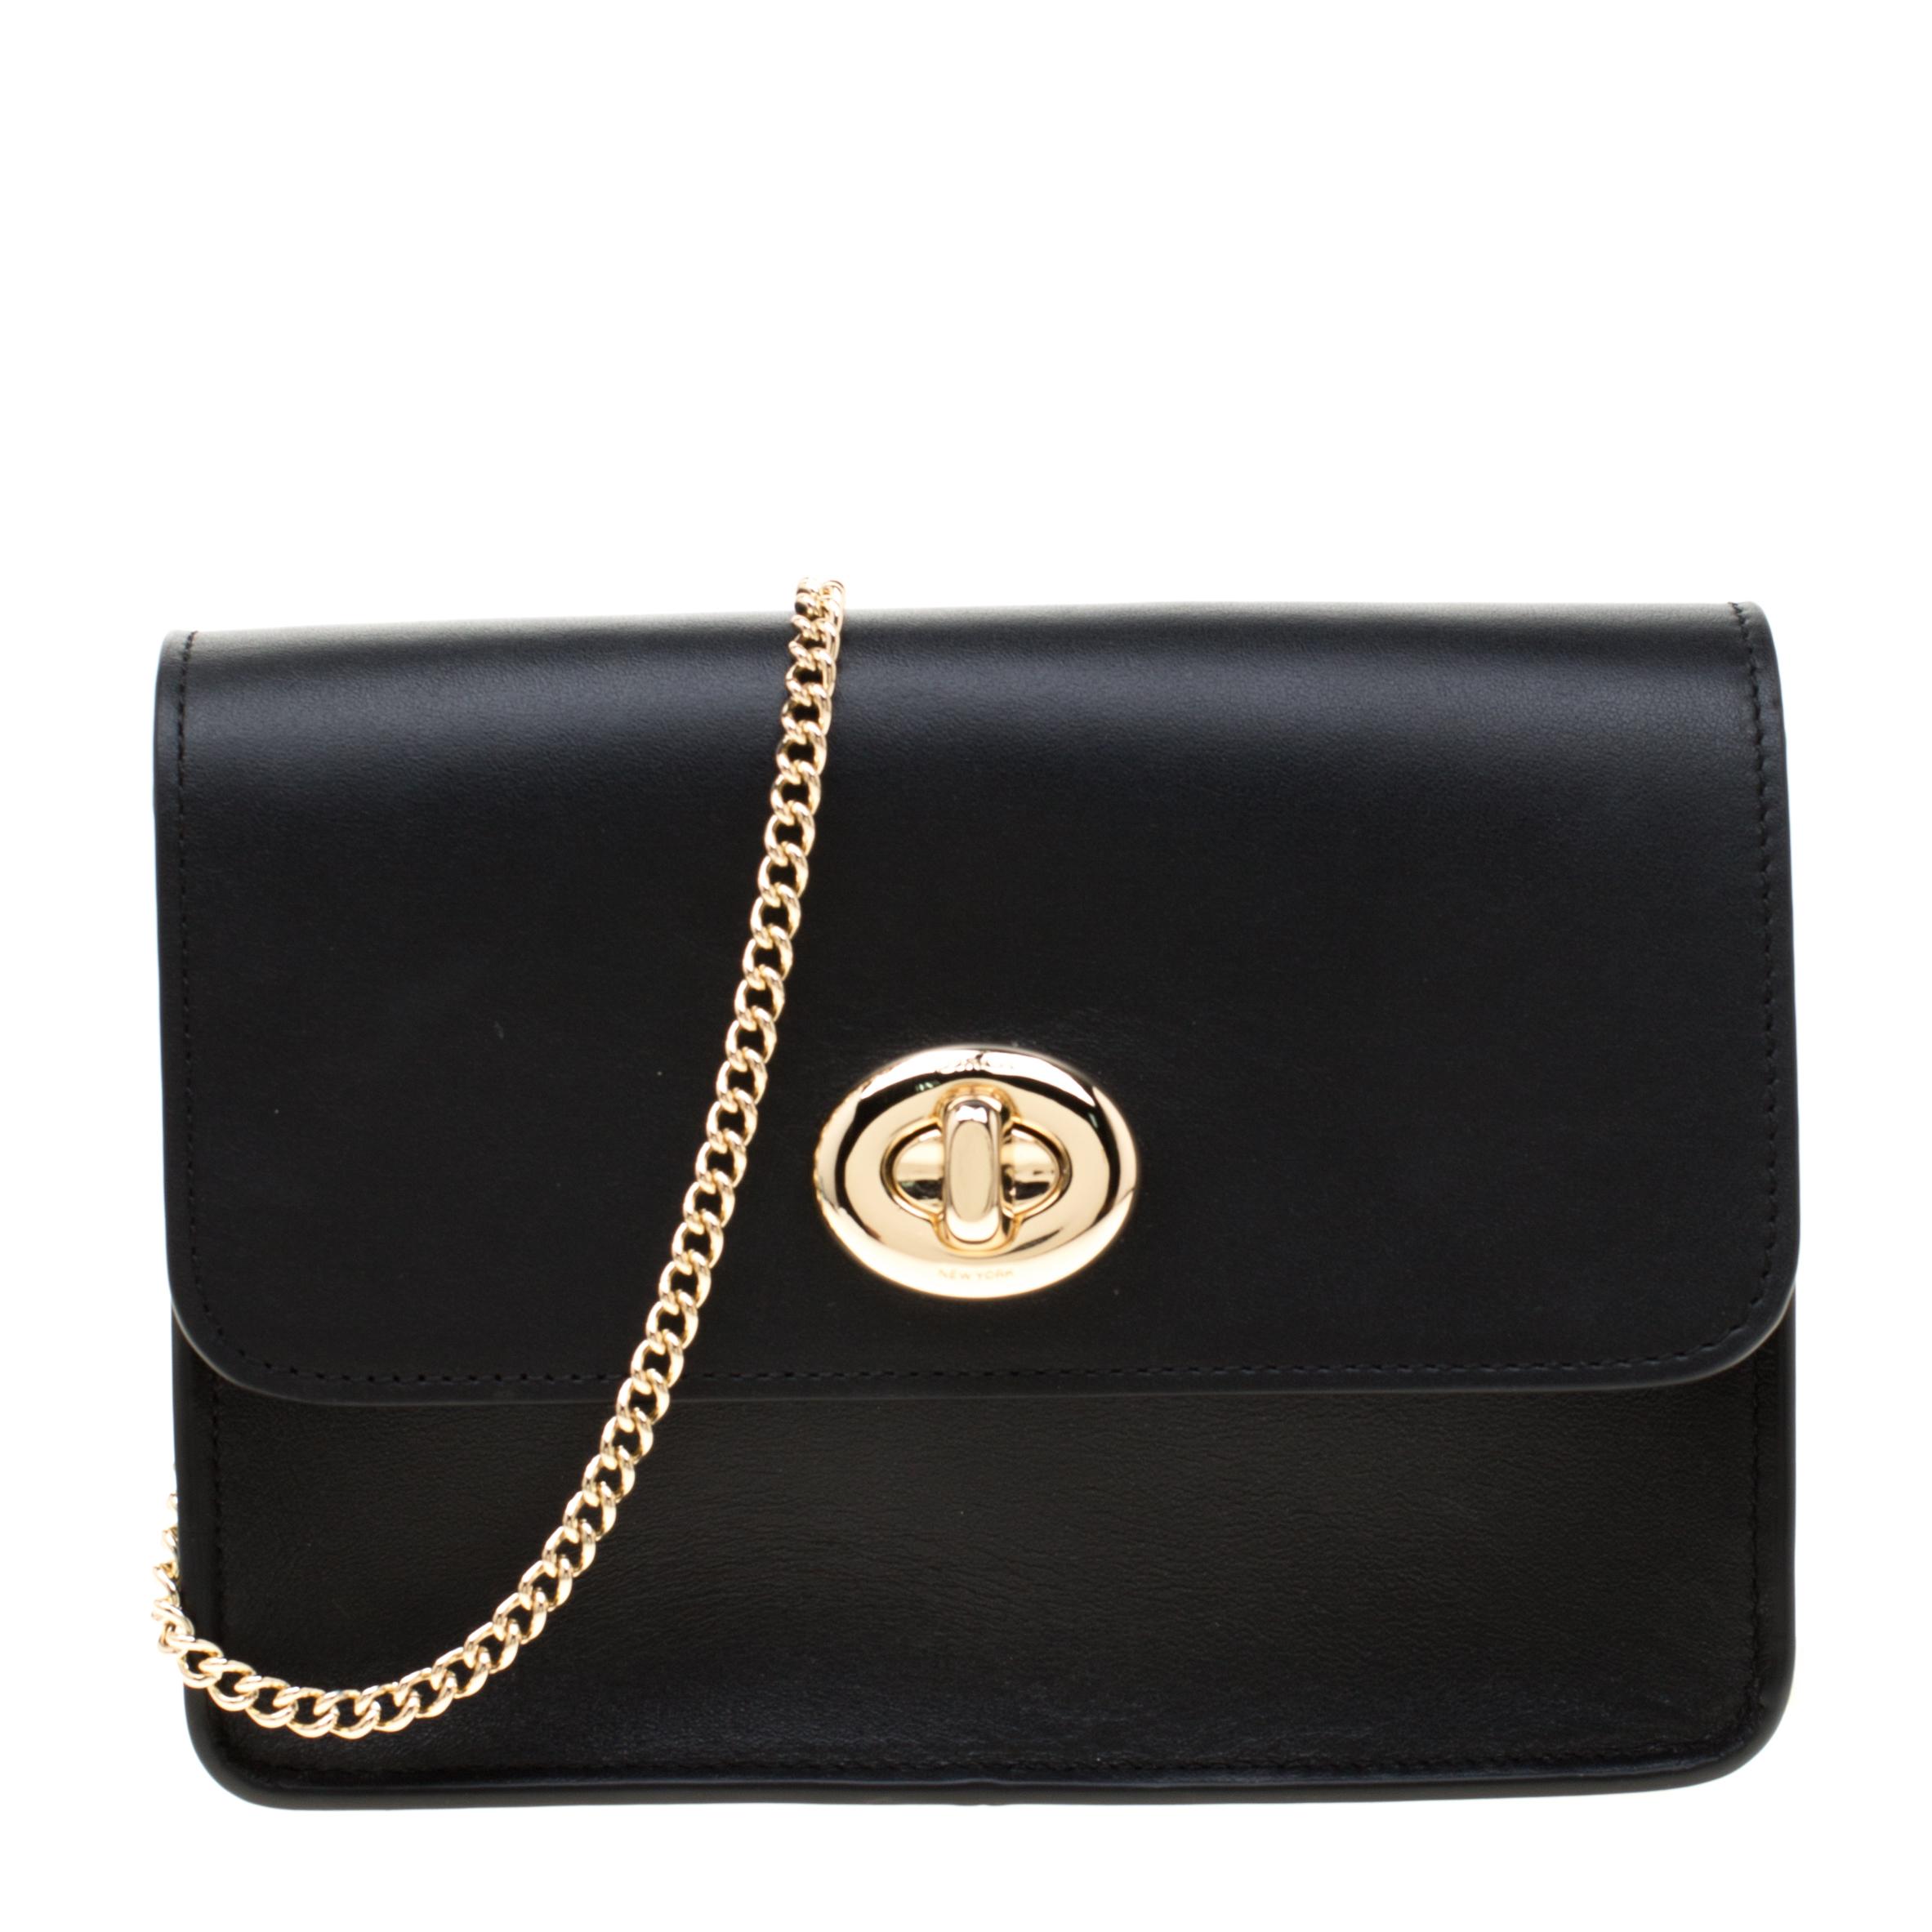 eb05063a0a Coach Black Leather Bowery Crossbody Bag